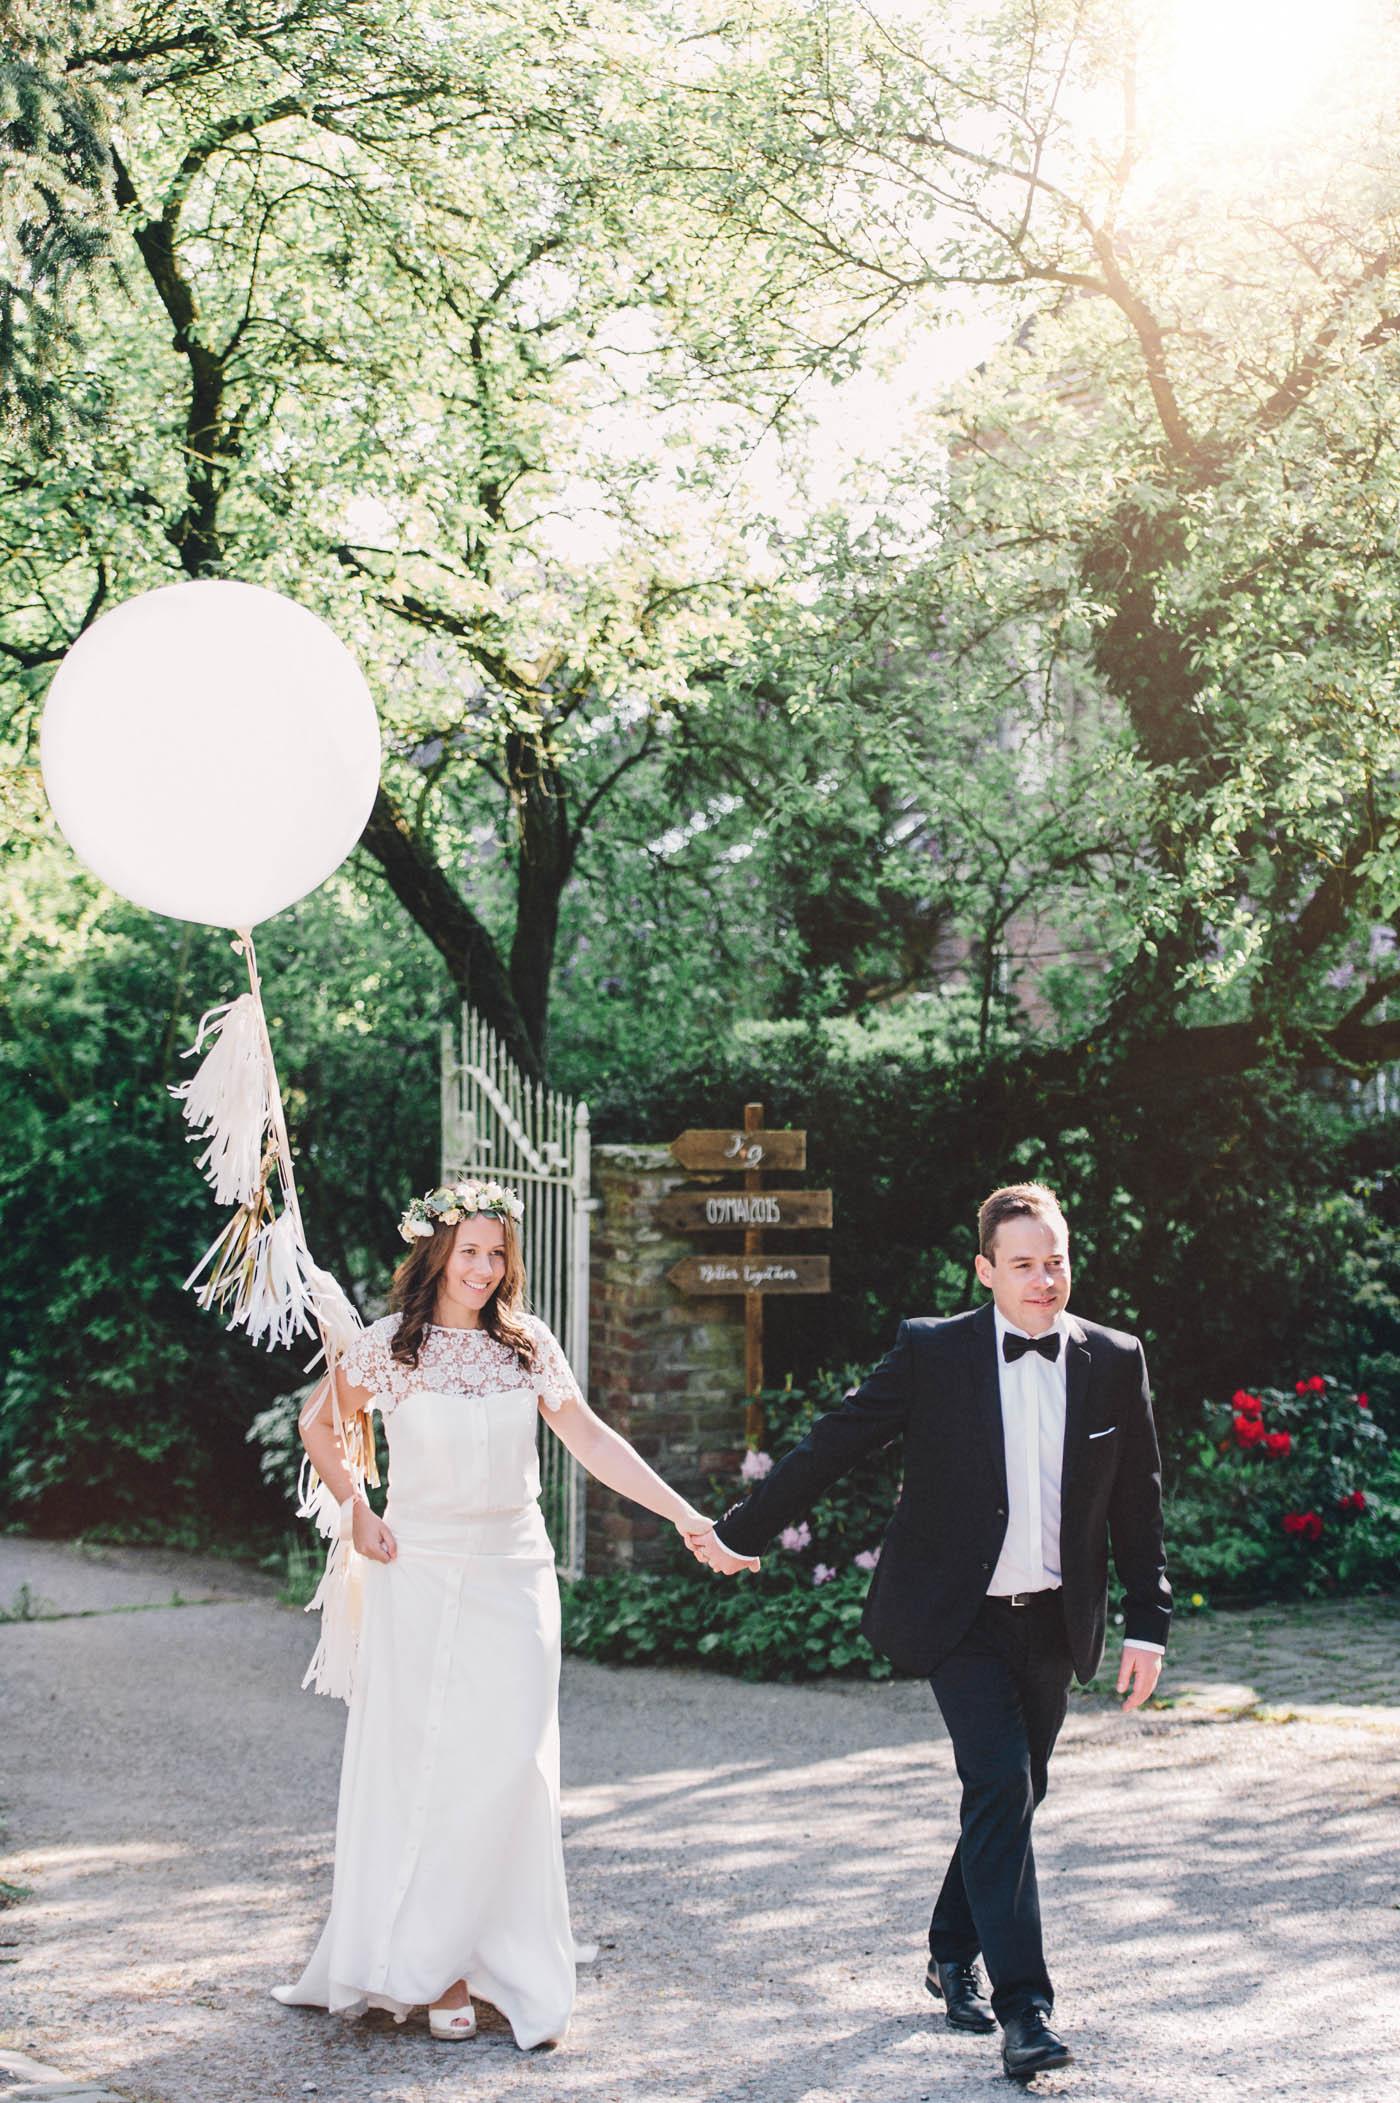 diy-wedding-nothenhof-hoch-3